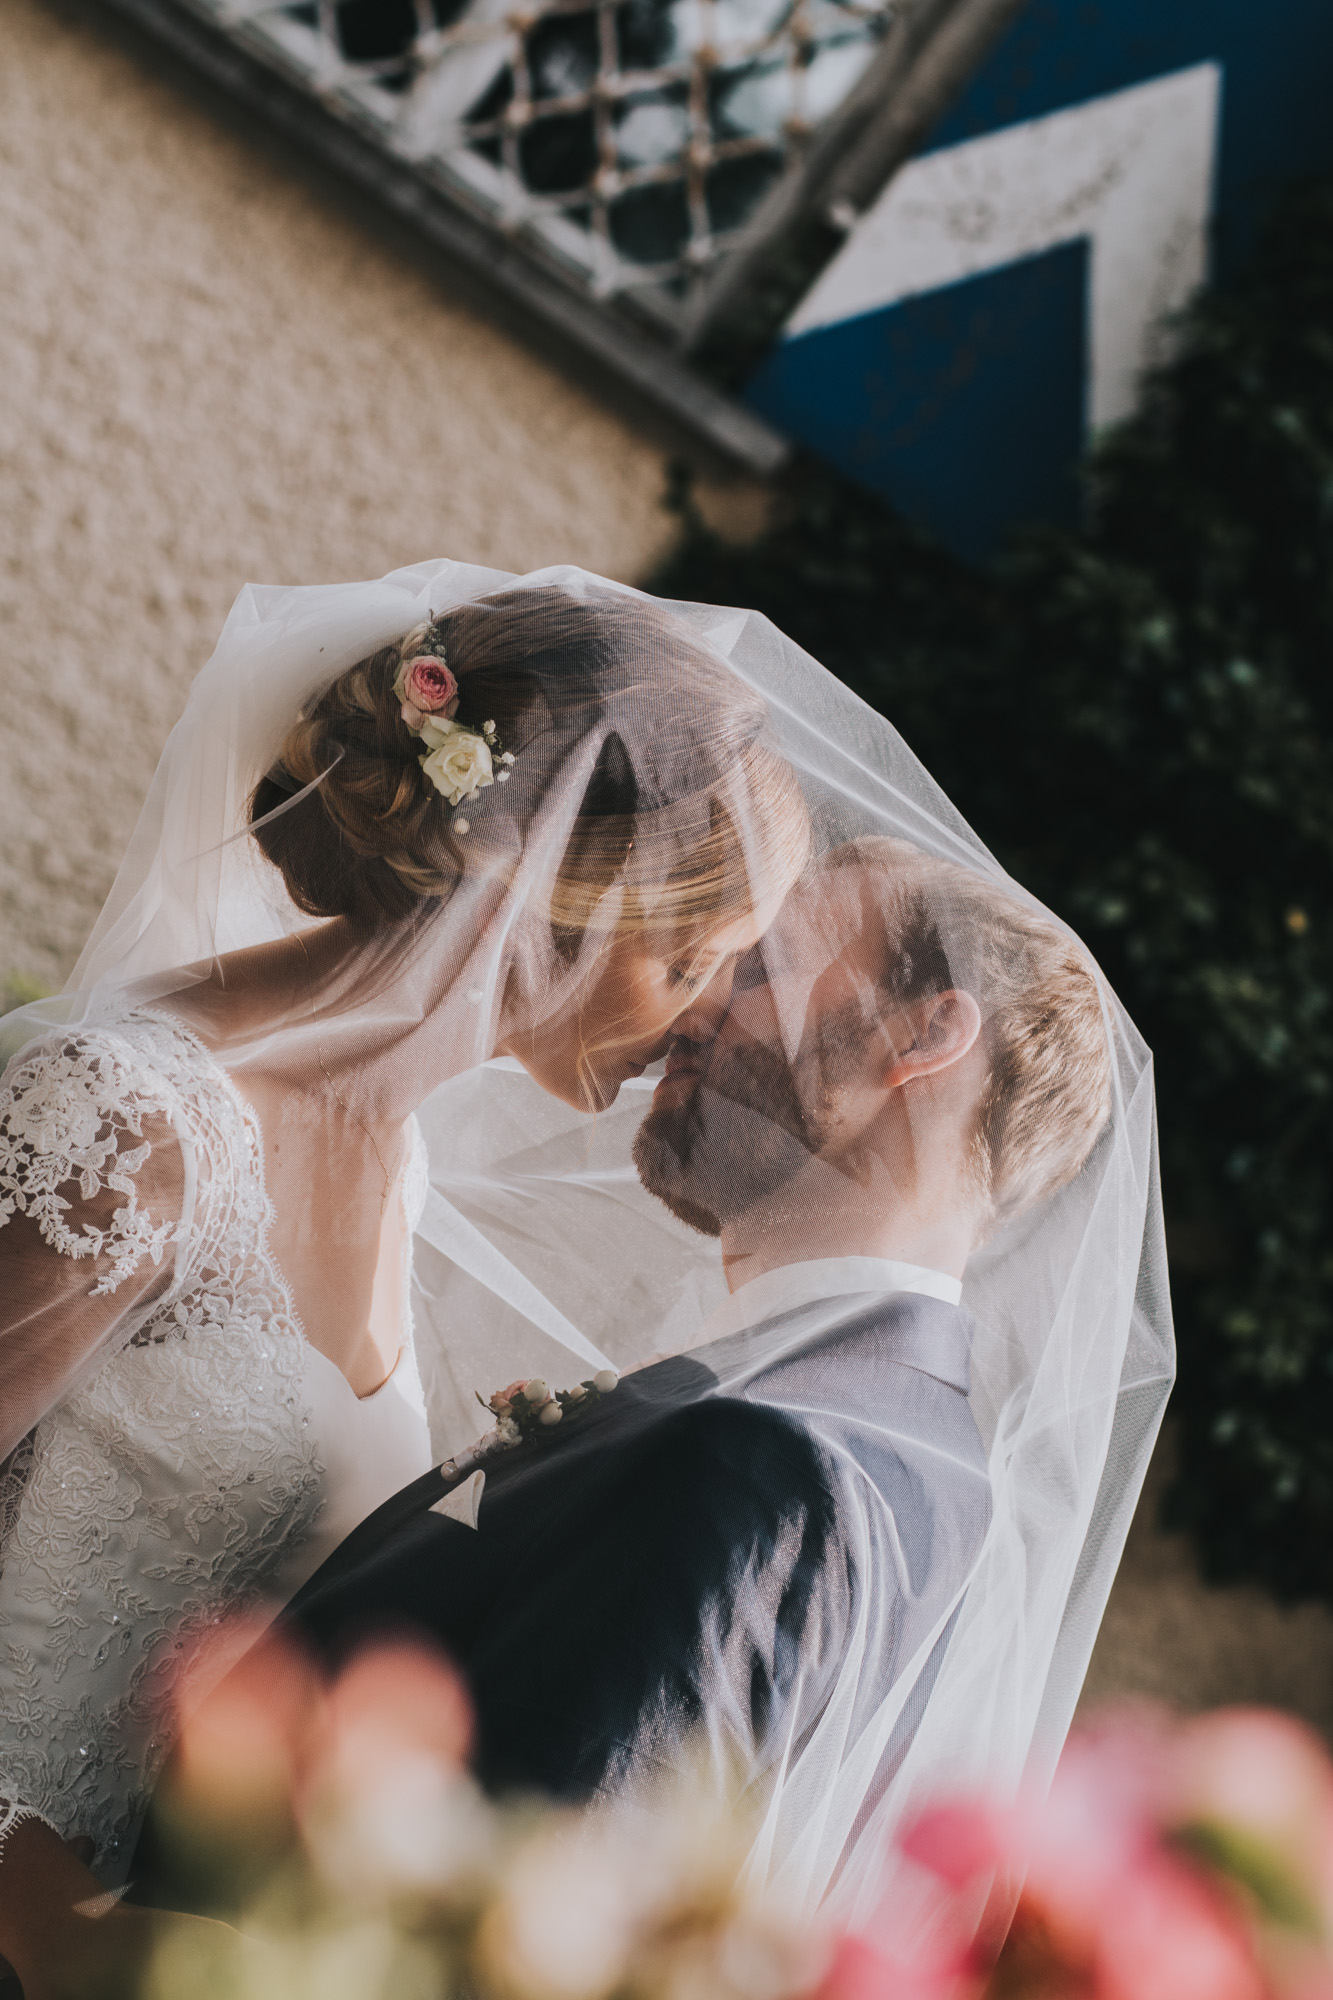 Hochzeit - Memory factory - 20180616-0058.jpg